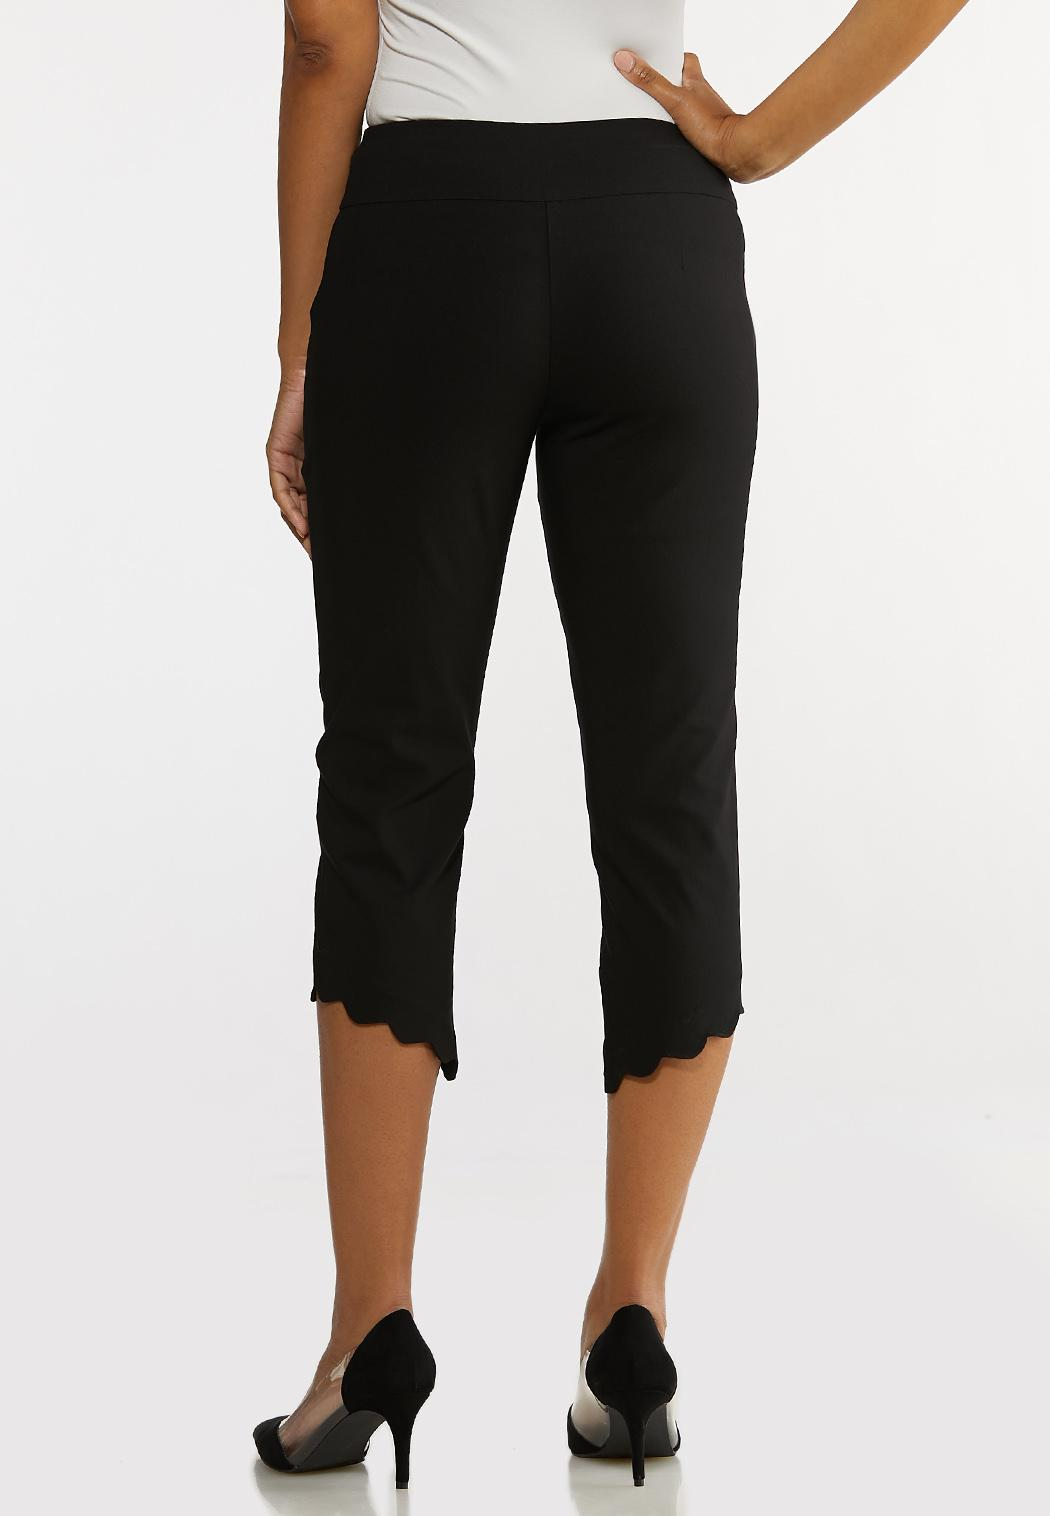 Cropped Scalloped Hem Pants (Item #44128436)